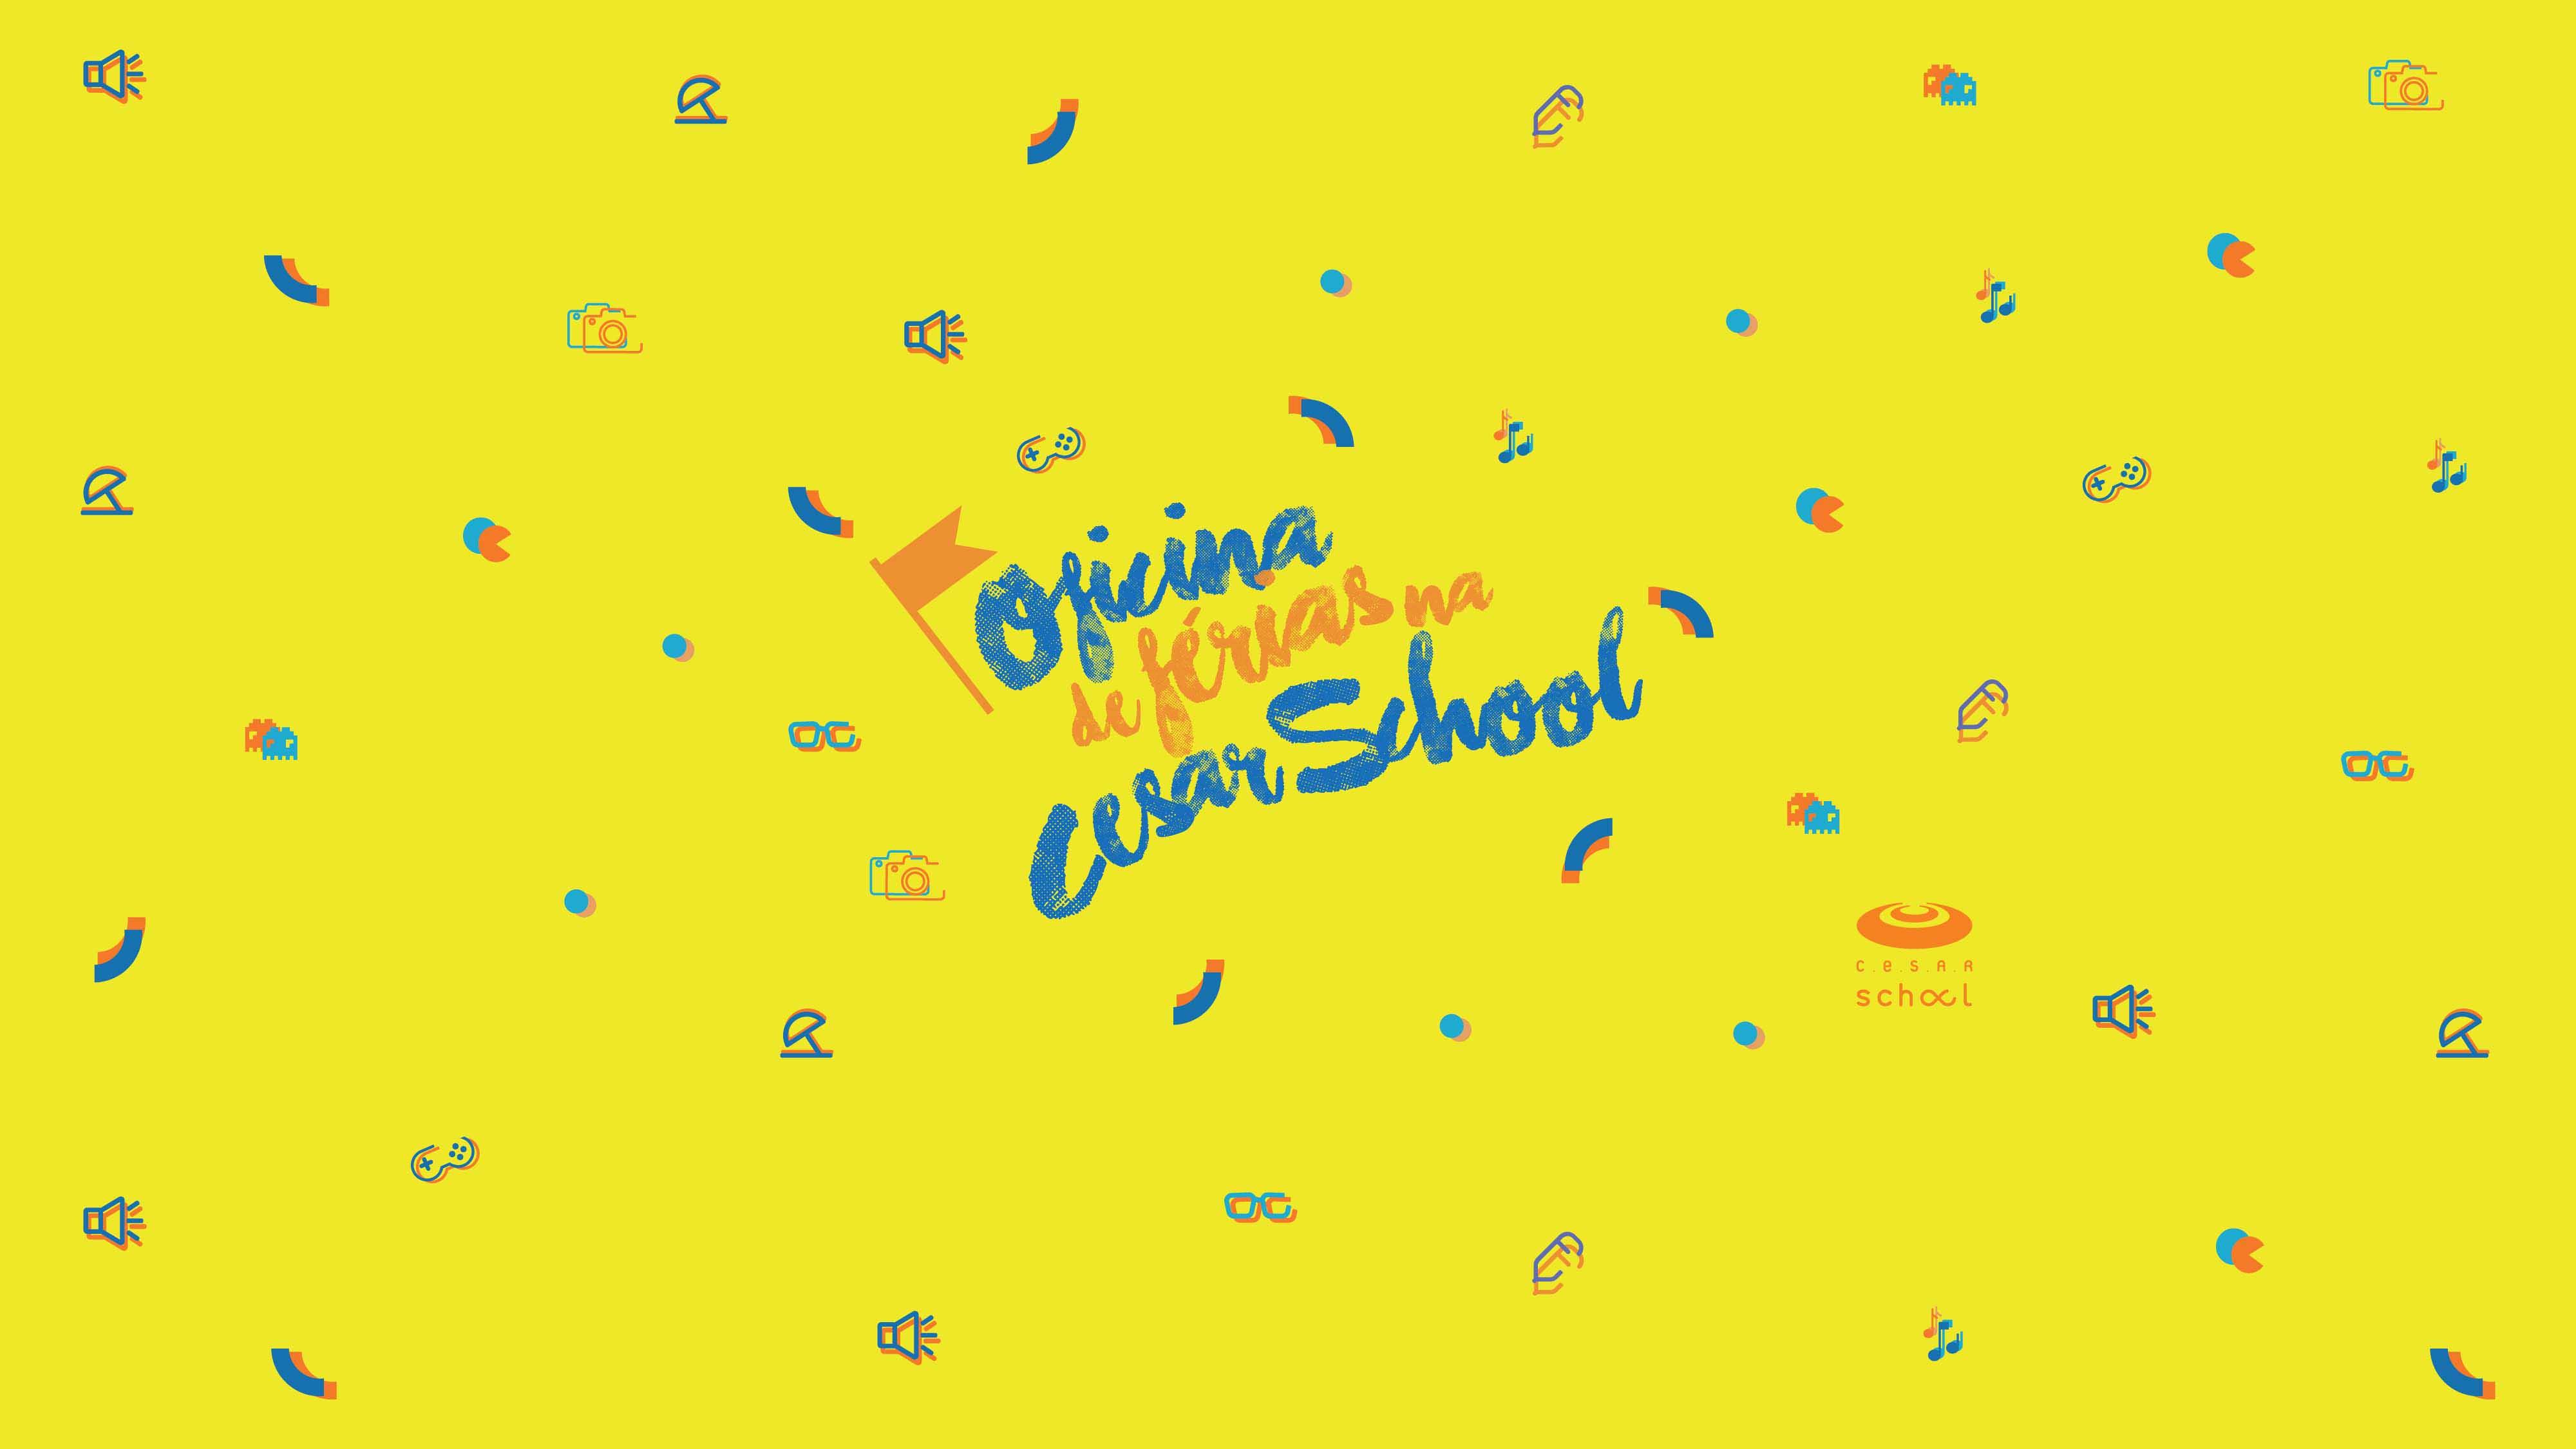 AF-CS-033-18-Banner Site Cesar School_Evento Ferias_Cesar School_1920x1080px2(1)